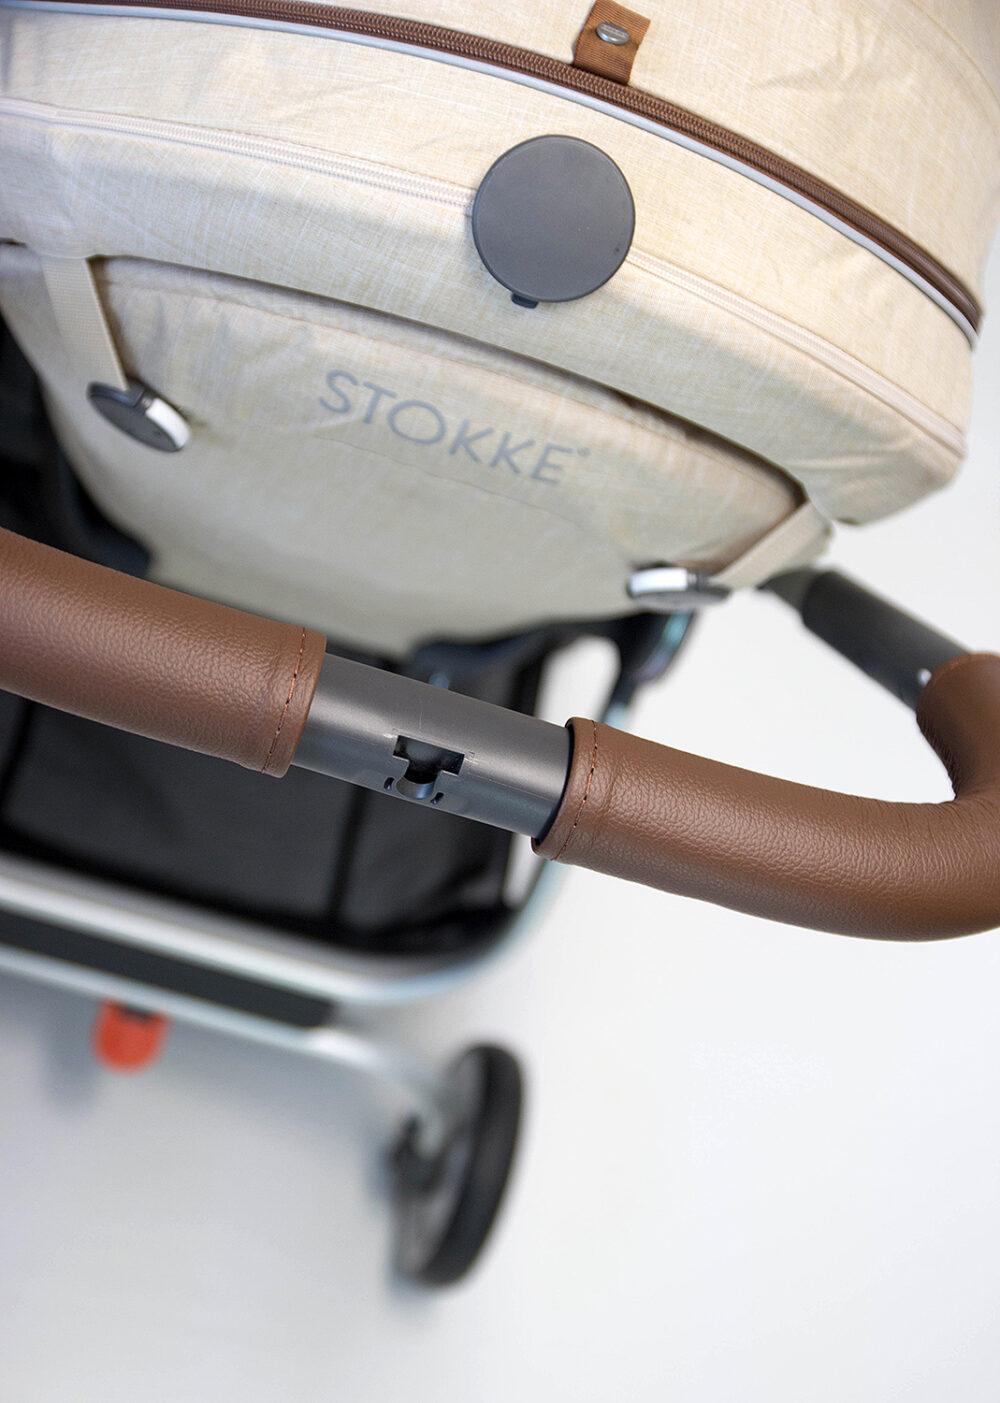 Stokke Scoot v1 Griffschoner zum Schnüren